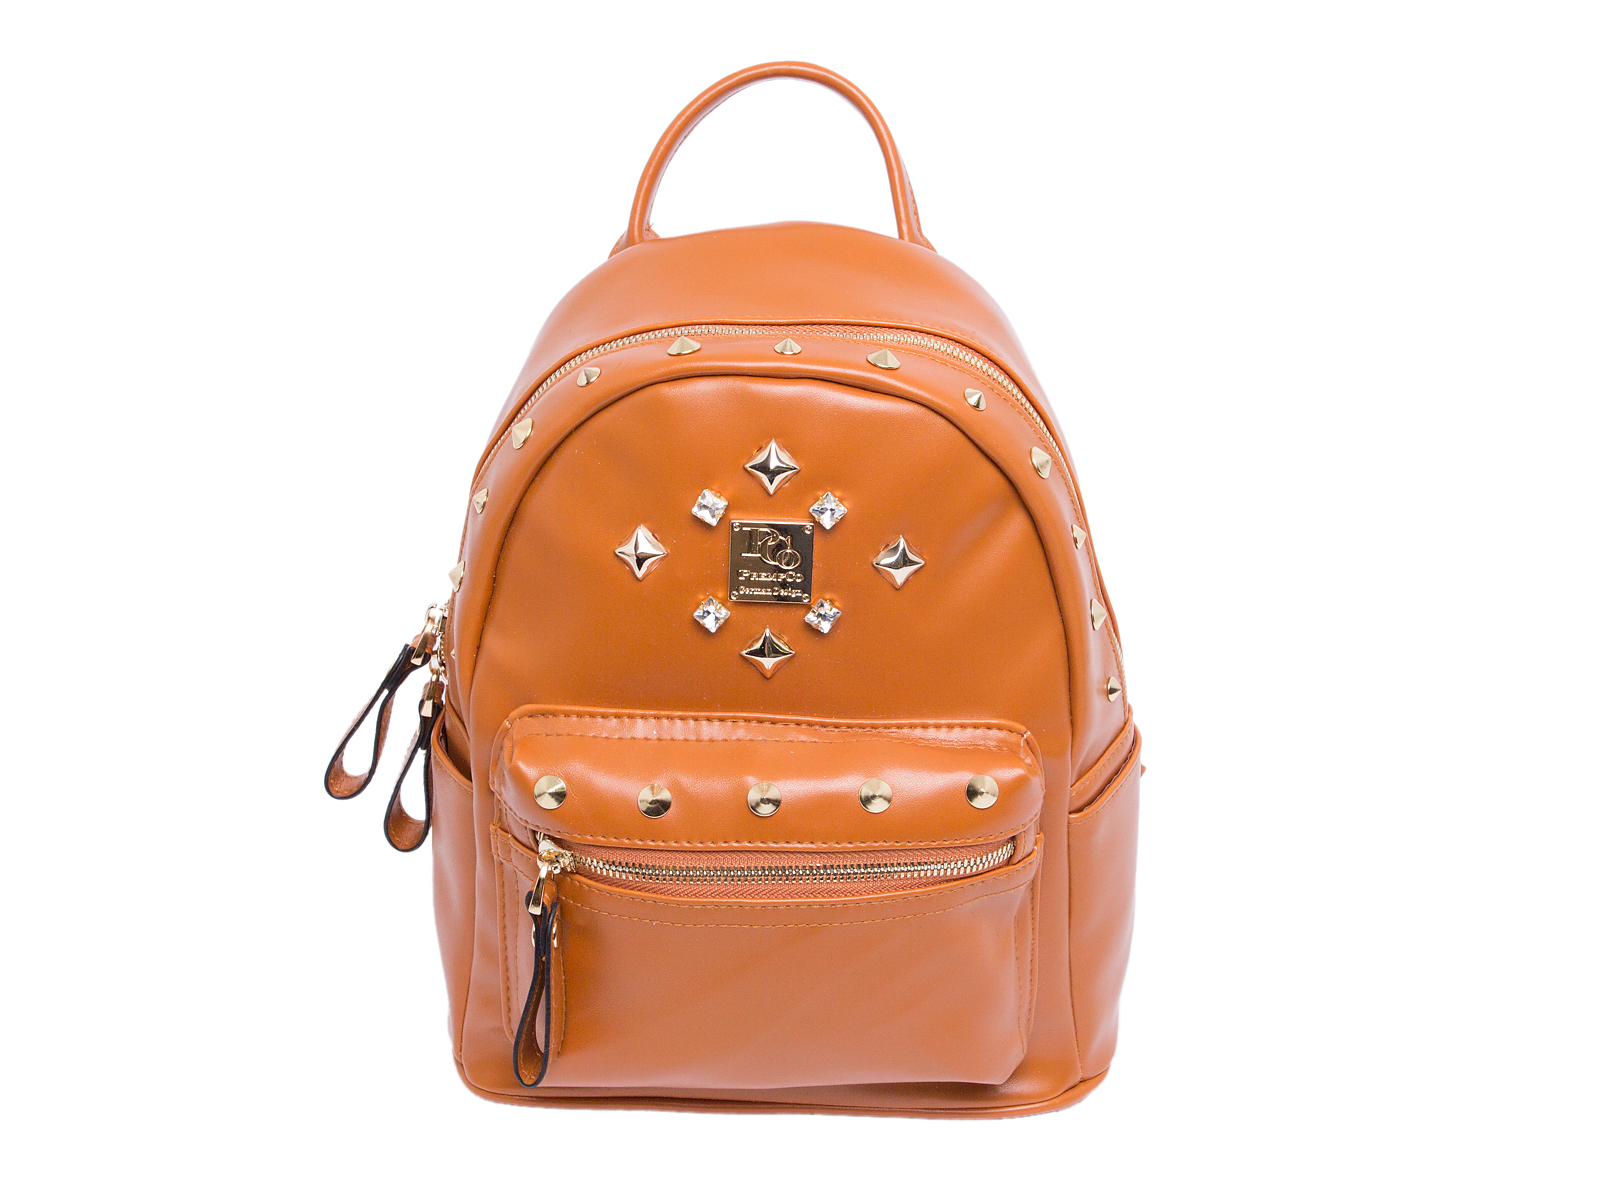 PCo mini damen rucksack Braun Designer Rucksack Luxus